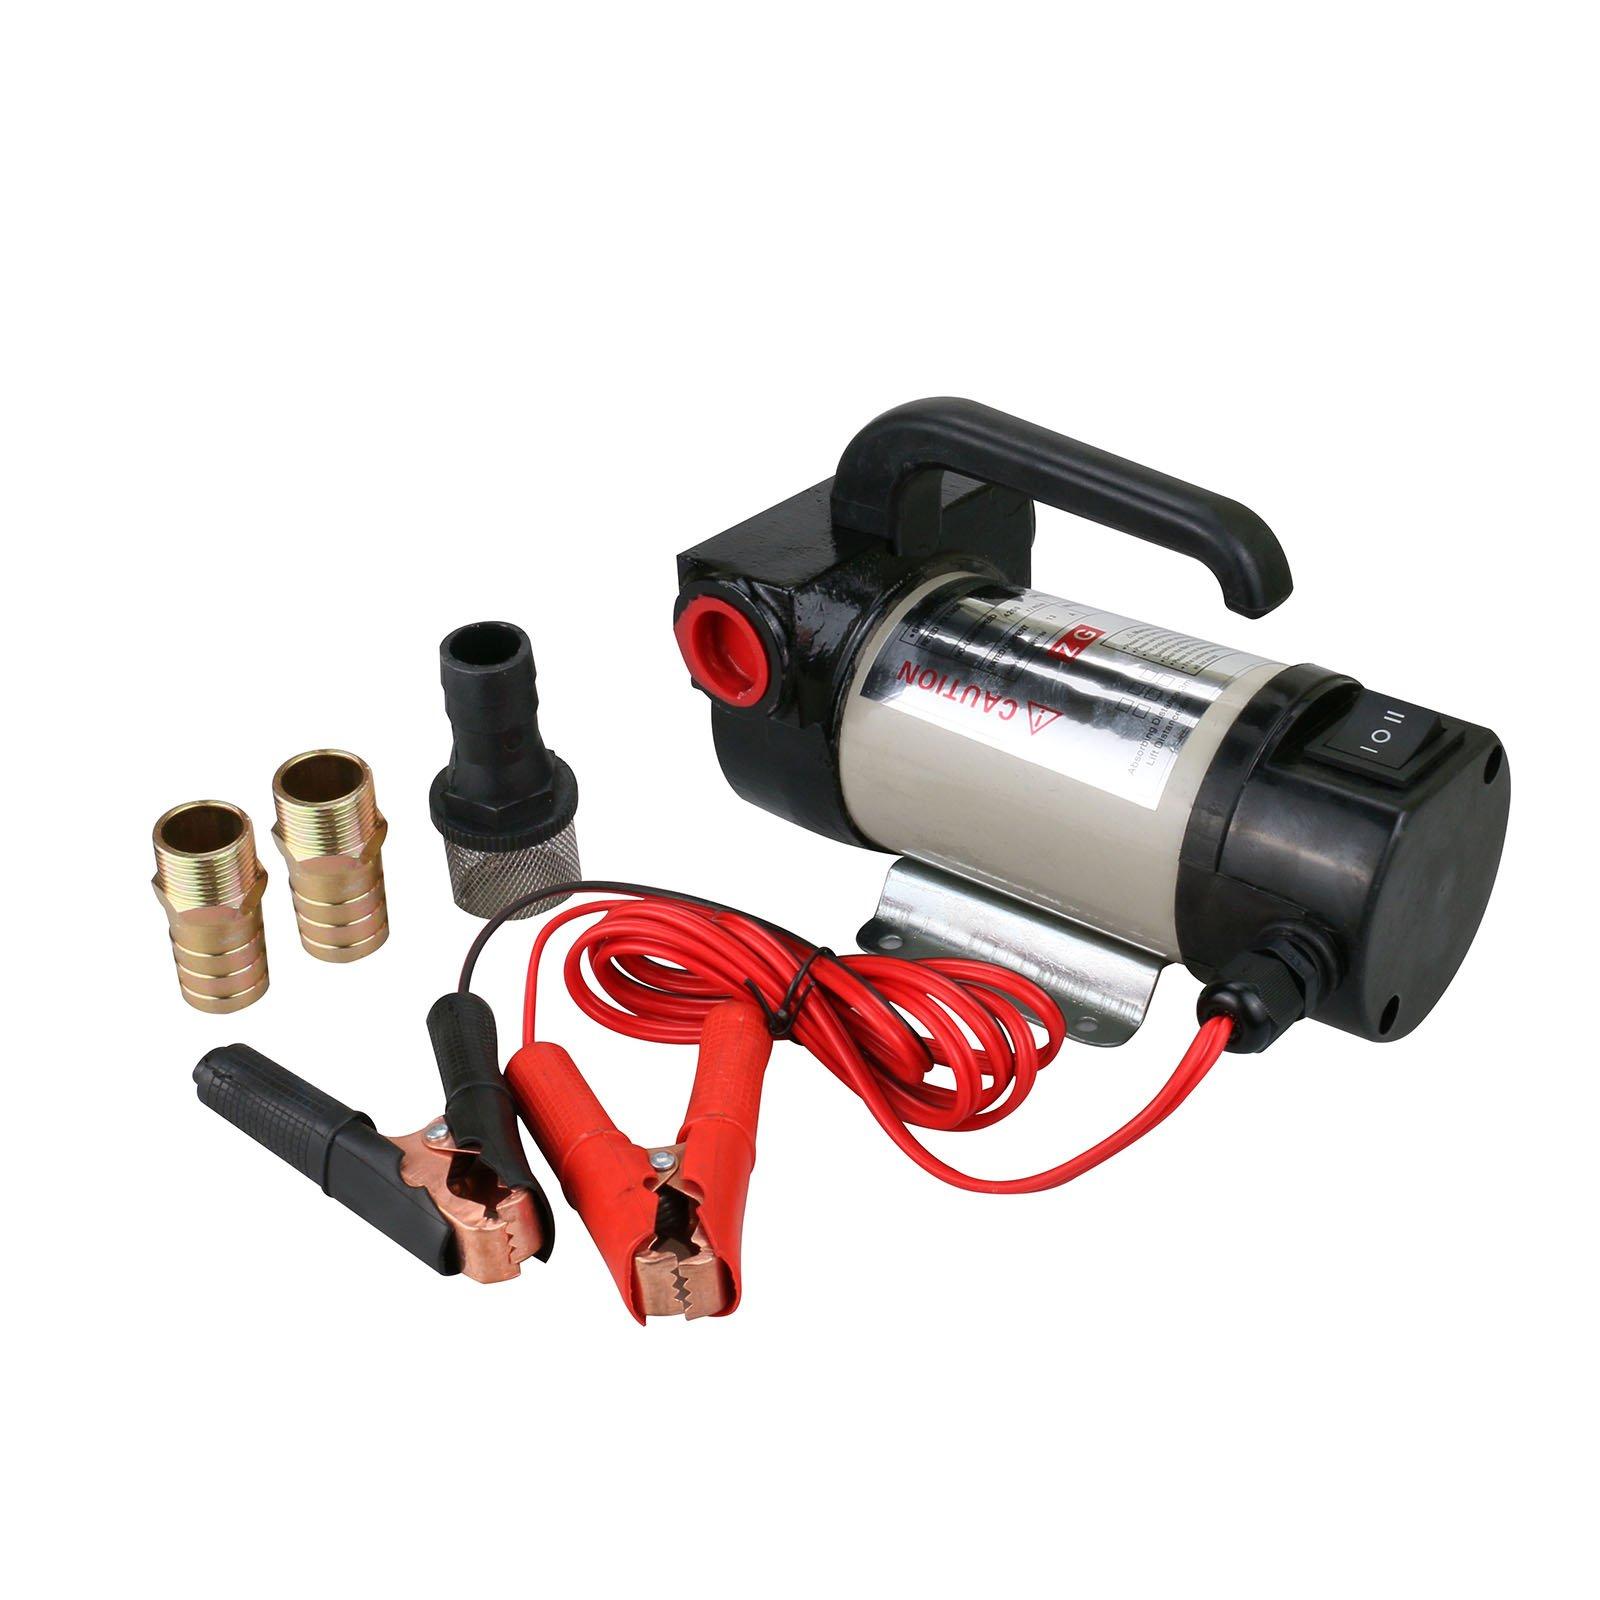 Diesel Oil Transfer Pump, Electric Tool Direct Current Pump Kit Alligator Clip 50L/min 24V DC by Mrcartool (Image #2)